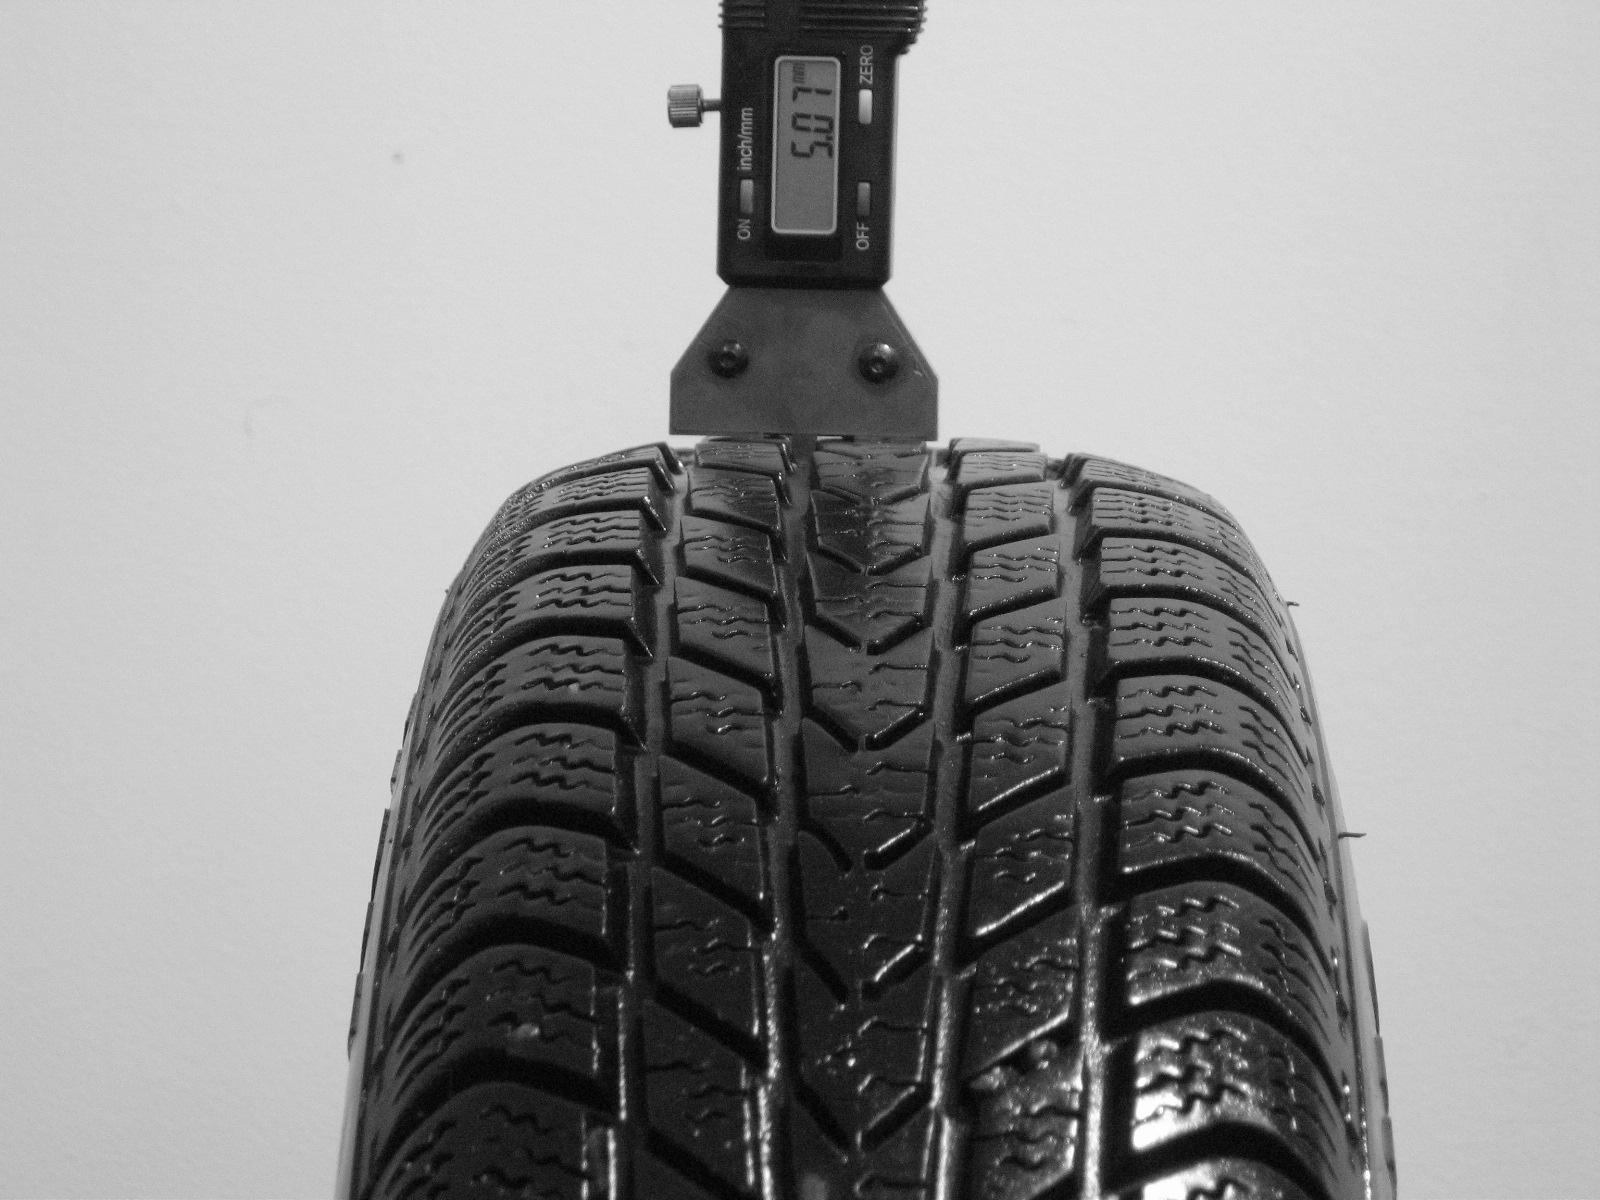 Použité-Pneu-Bazar - 155/80 R13 KUMHO KW 7400 -kusovka-rezerva 3mm